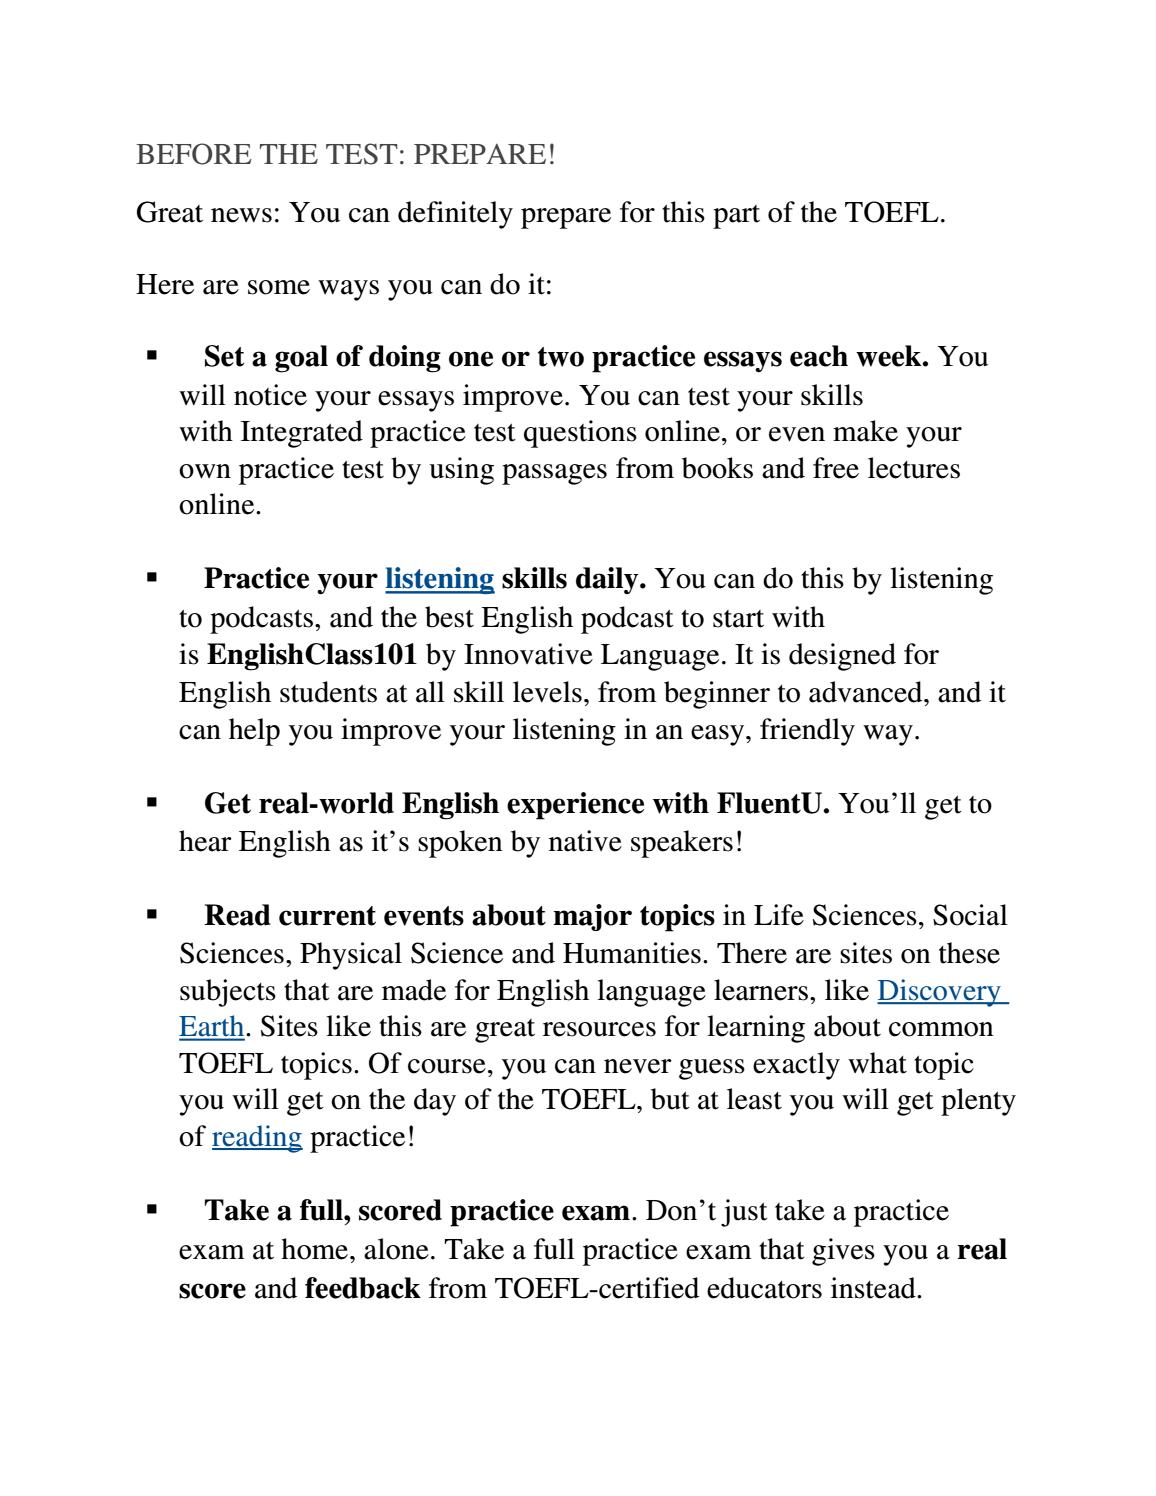 020 Page 1 Essay Toefl Topics Dreaded 2017 185 Pdf Ets Full